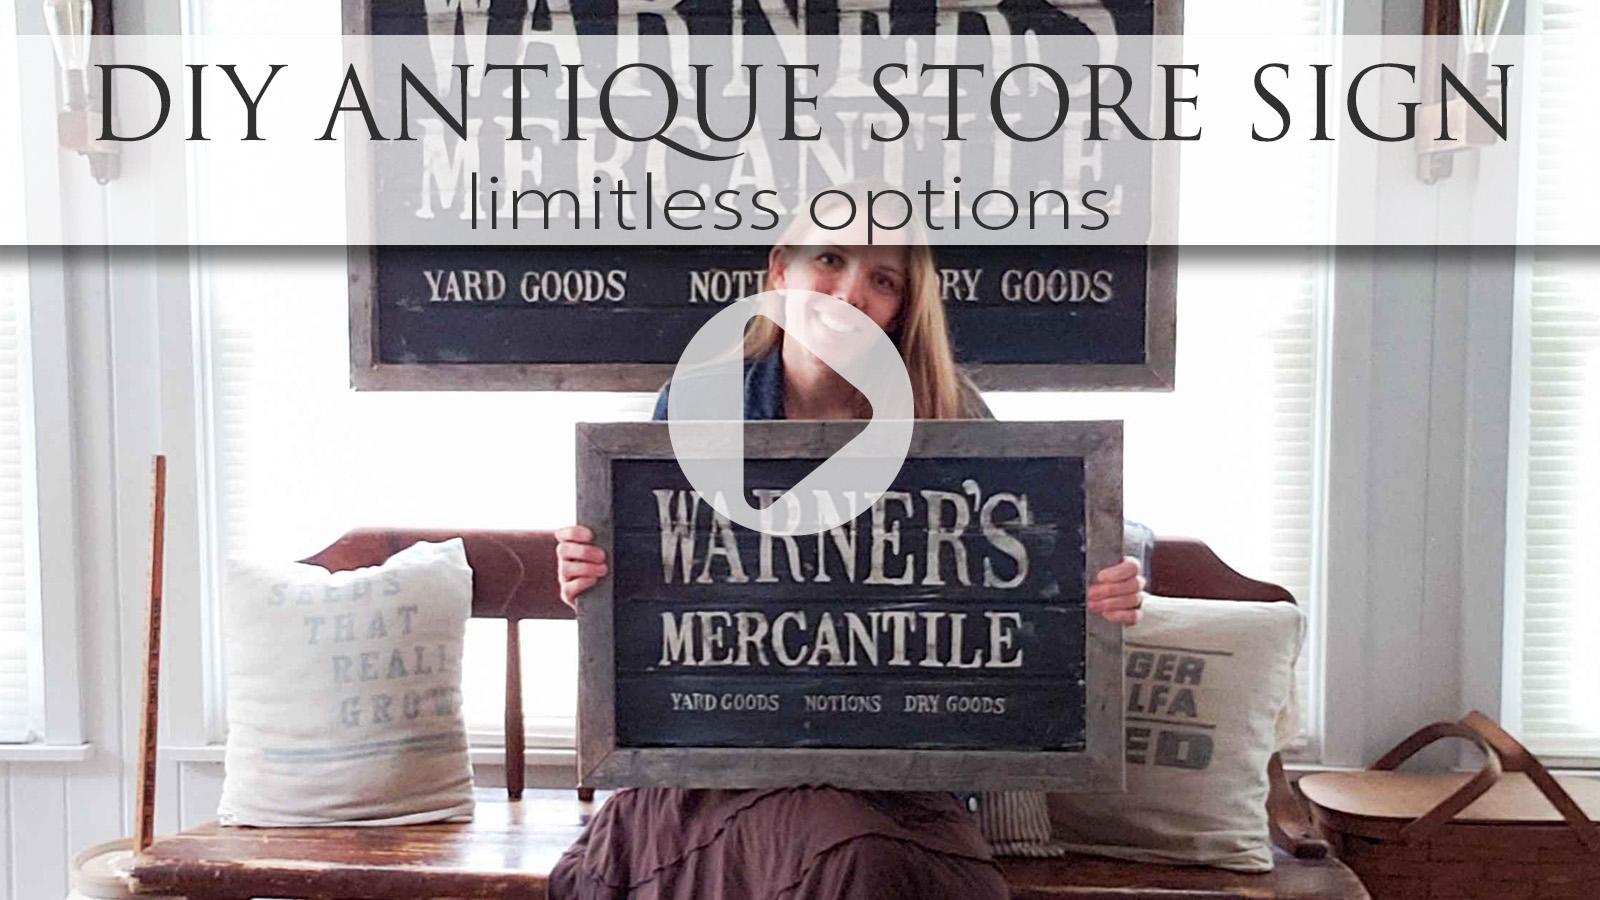 DIY Video Tutorial for Antique Store Sign by Larissa of Prodigal Pieces   prodigalpieces.com #prodigalpieces